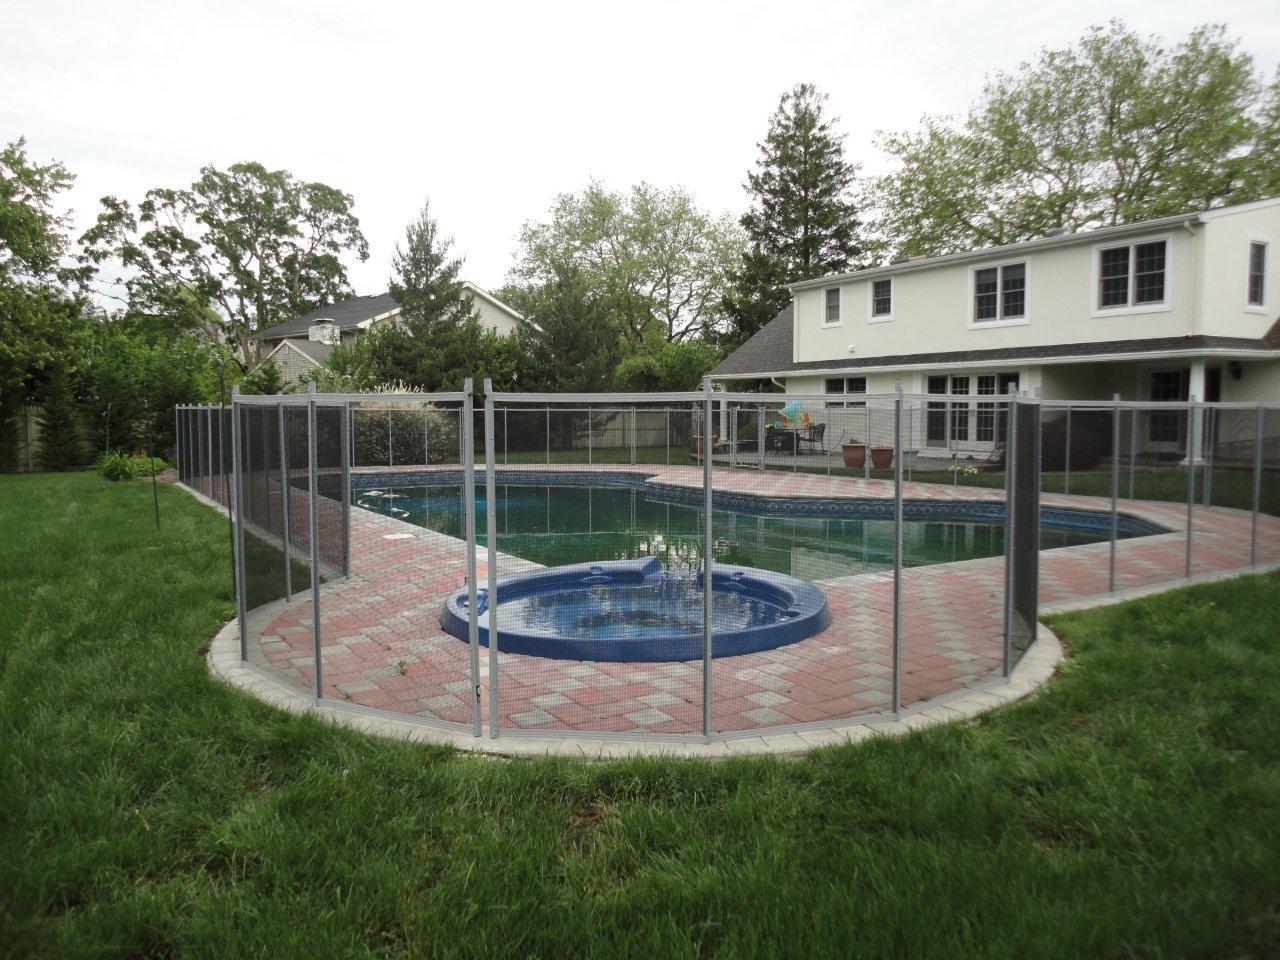 Pool Fence Pasadena Ca Pool Fencing California 91101 91102 91103 91104 91109 91110 91121 91125